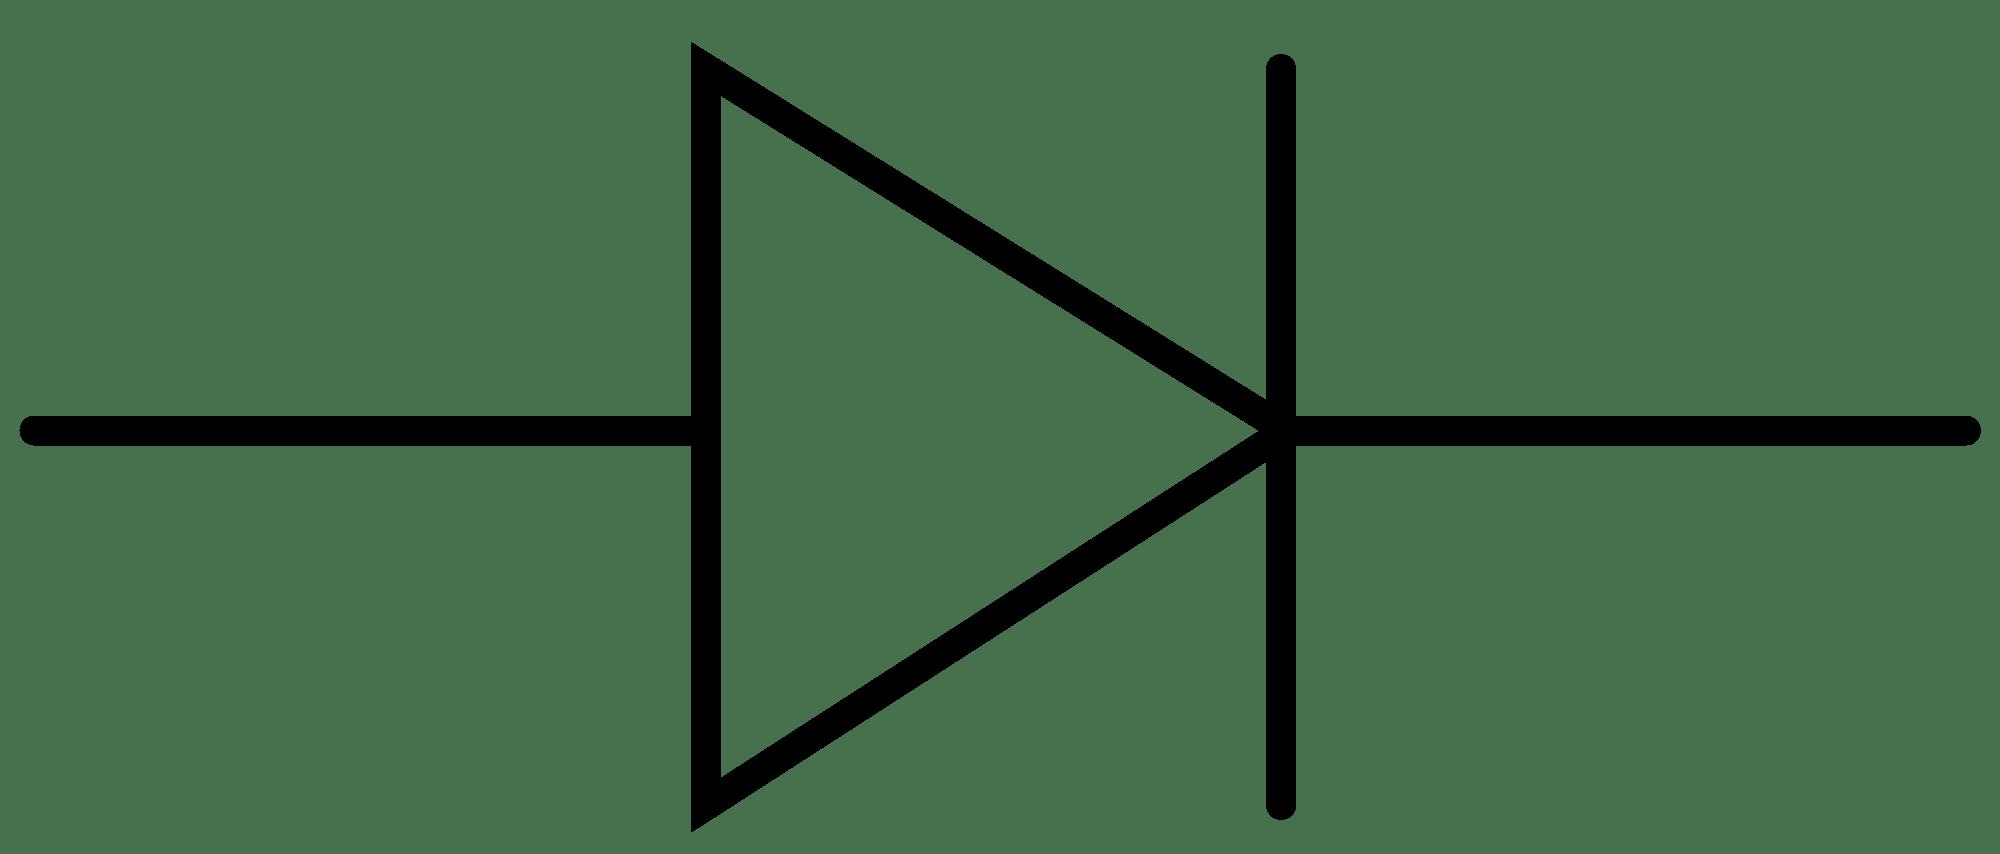 Light Dependent Resistor Schematic Preamplifer